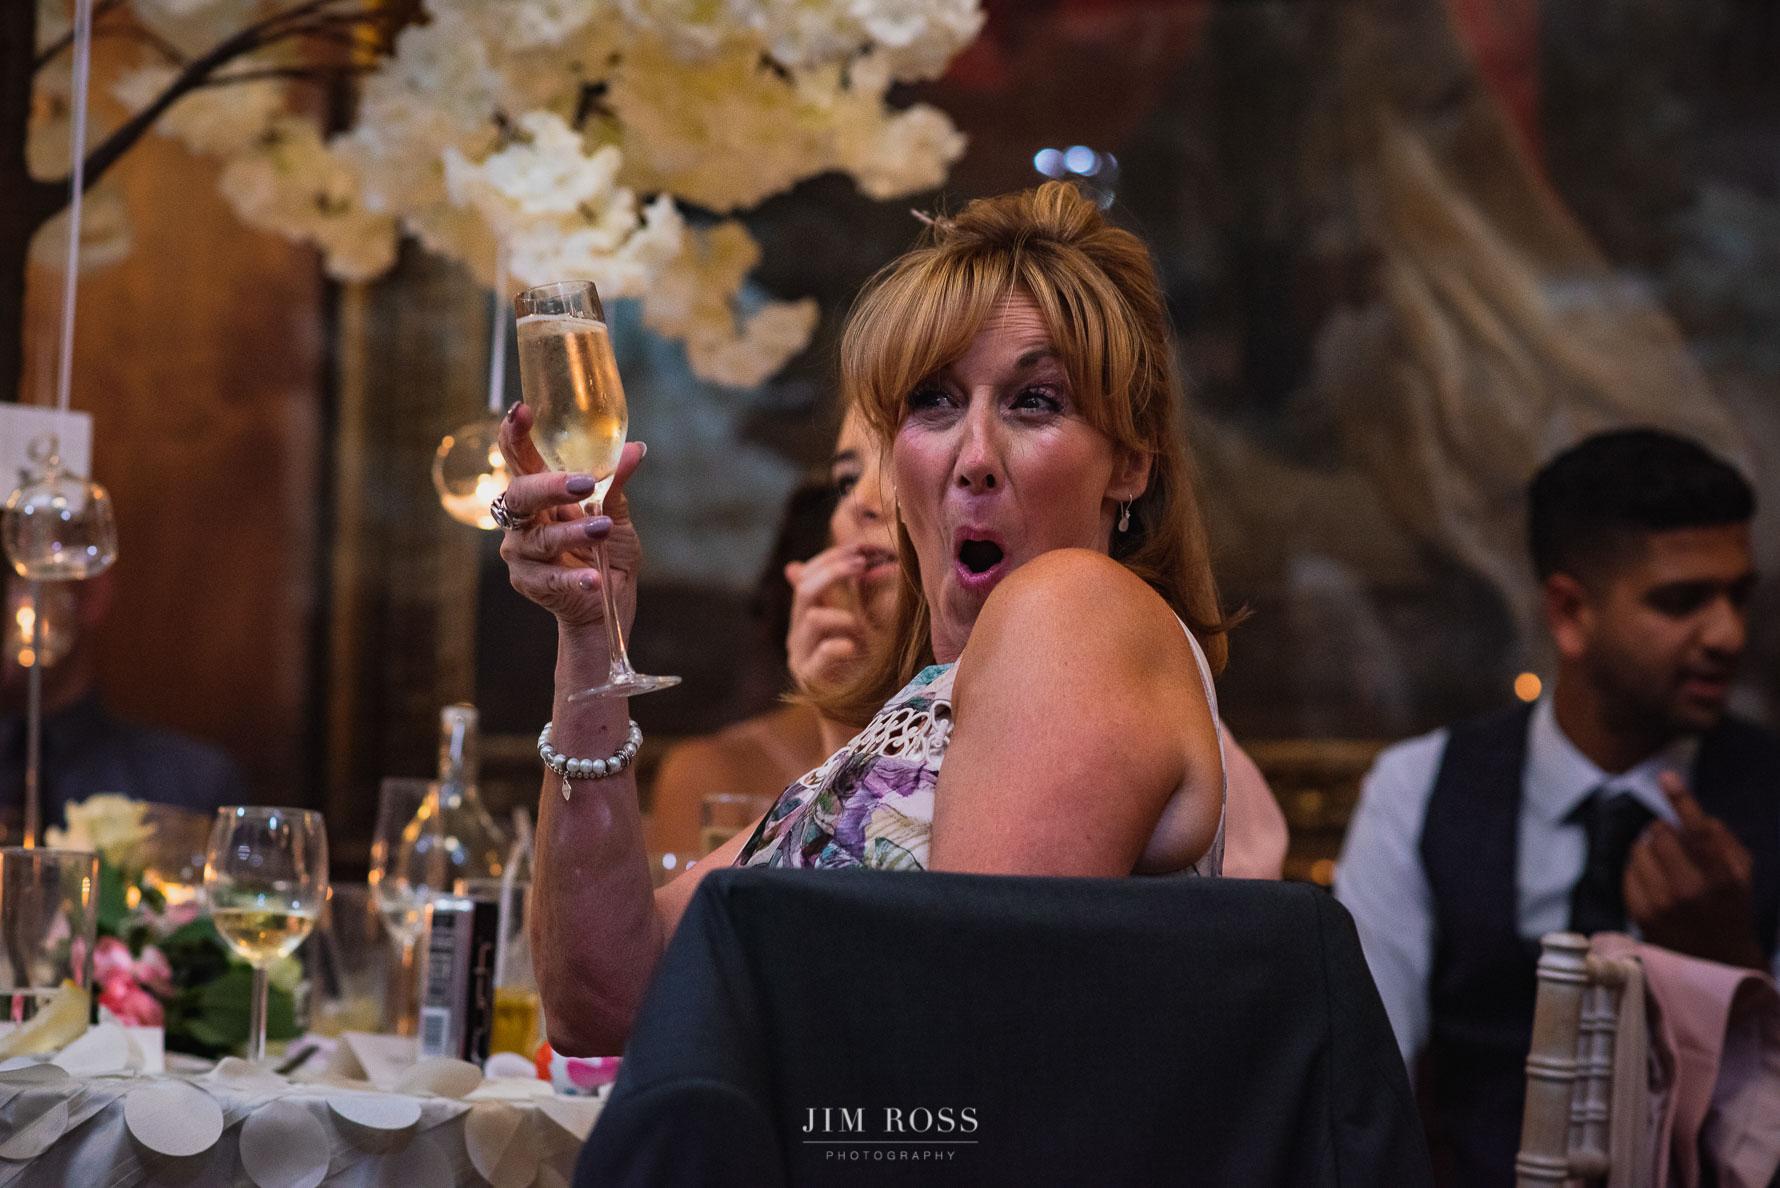 Opulent dining room and fun speech